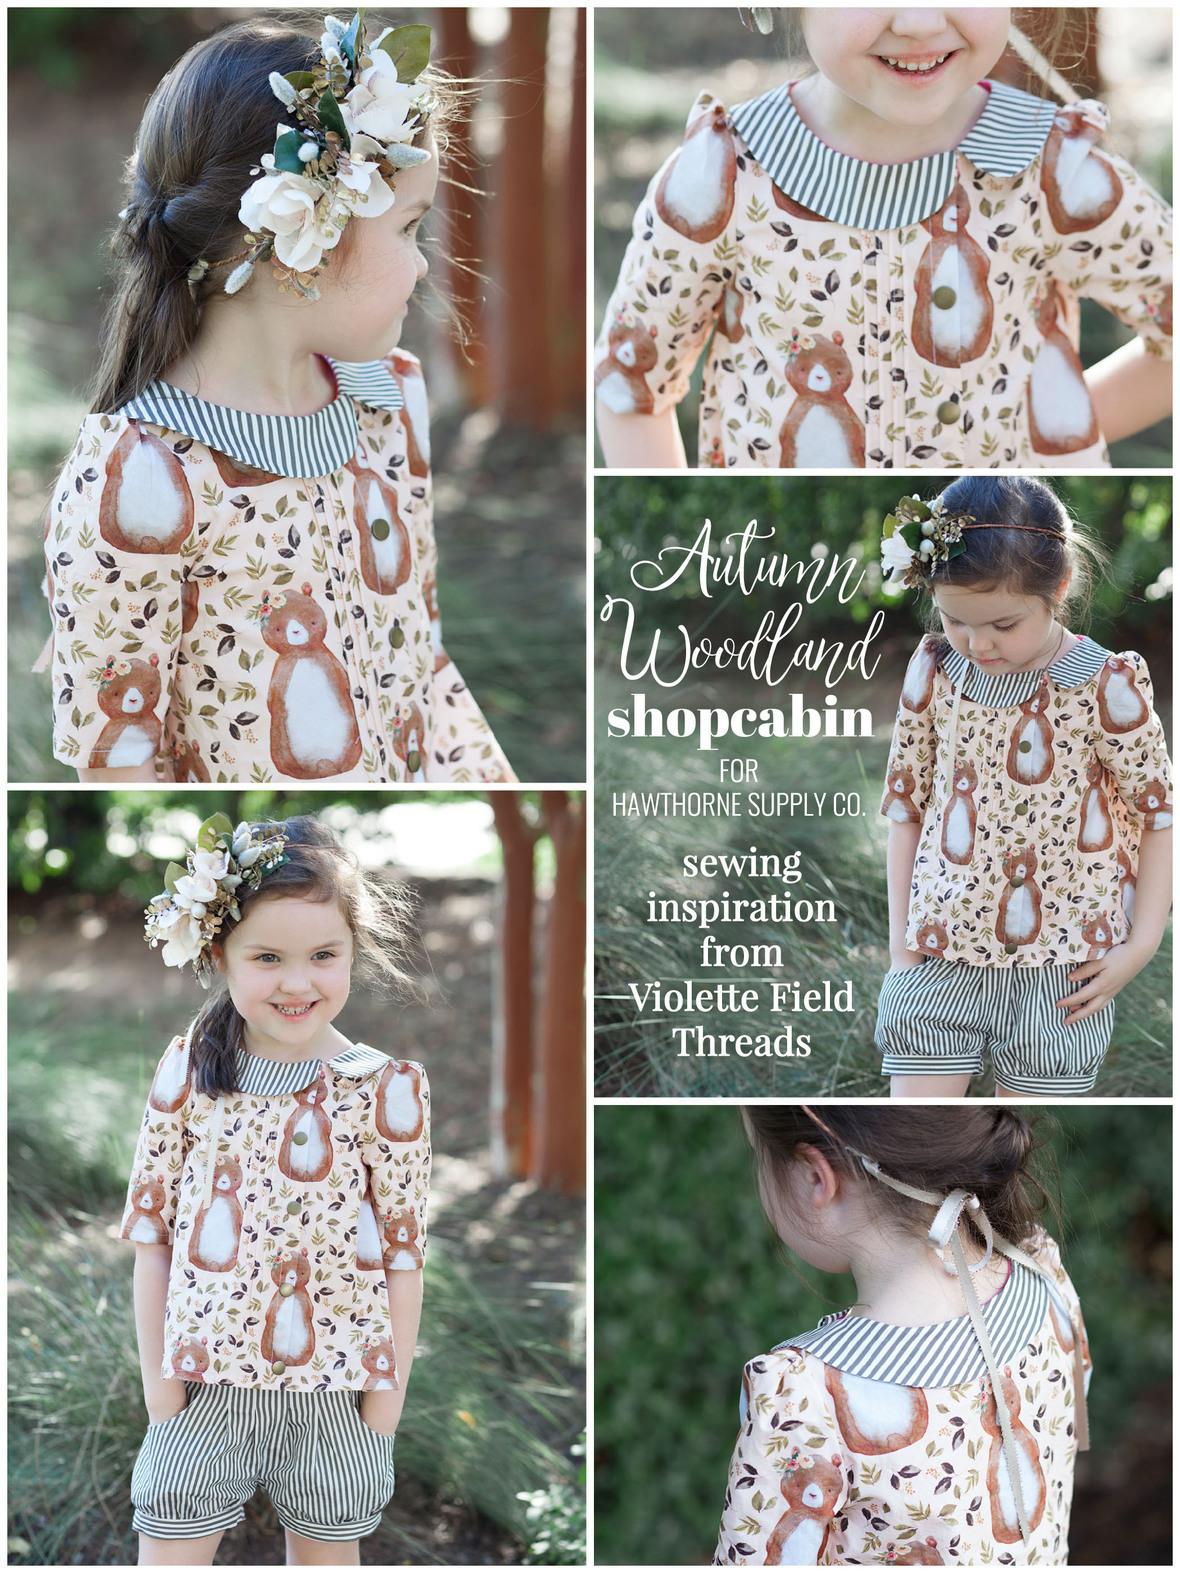 Ashley Cowan Autumn Woodland Shopcabin for Hawthorne Supply Co 2